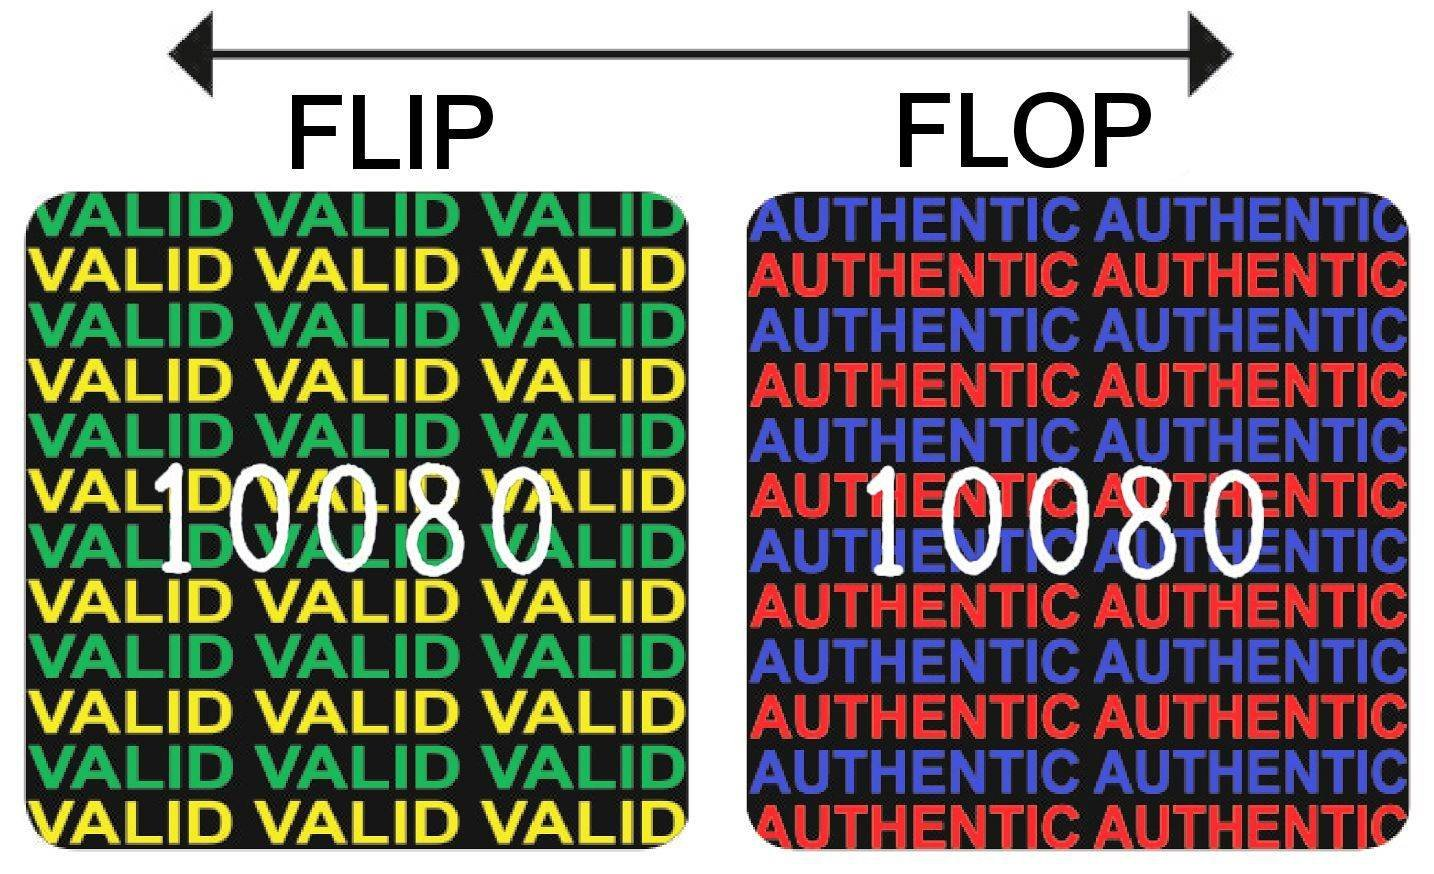 Medie 15mm Adesivo Quadrato Ologramma, NUMERATO, Etichette d'Argento, VALID / AUTHENTIC Flip-Flop, Antimanomissione, VALIDA / AUTENTICO, Sicura, Originale, Garanzia, Sicurezza, Etichette Ologramma, Auto-Adesivi, Adesivi Ologramma, Sigilli di Sicurezza, Sde